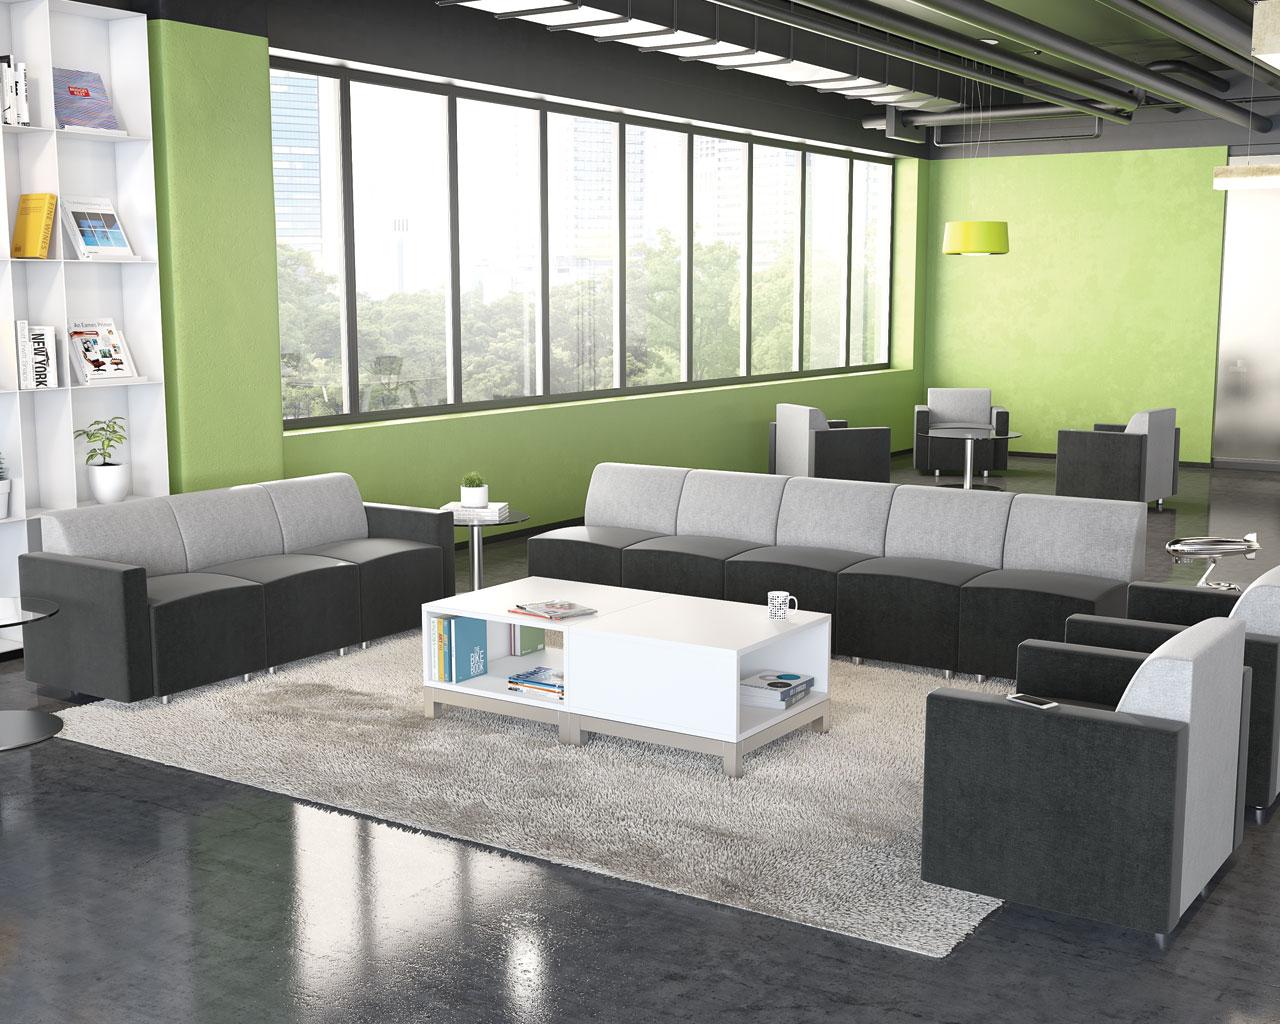 Brighton Modular Reception Seating  Source Office Furniture